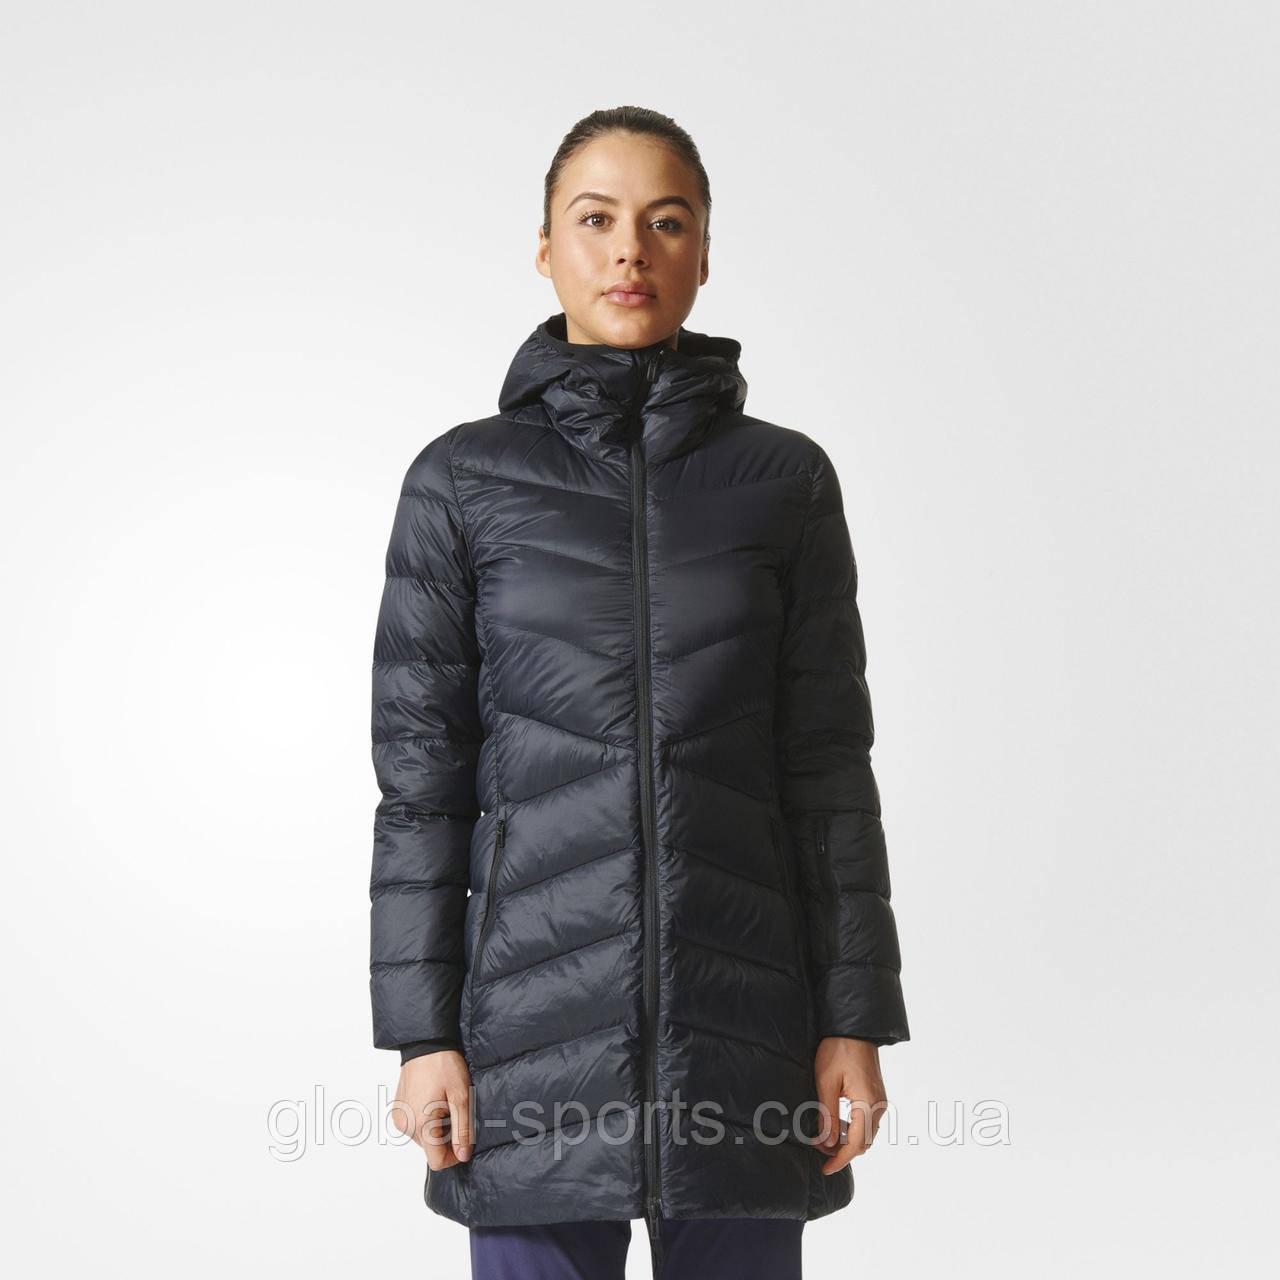 Женский пуховик Adidas Outdoor NUVIC(Артикул:BS0985)